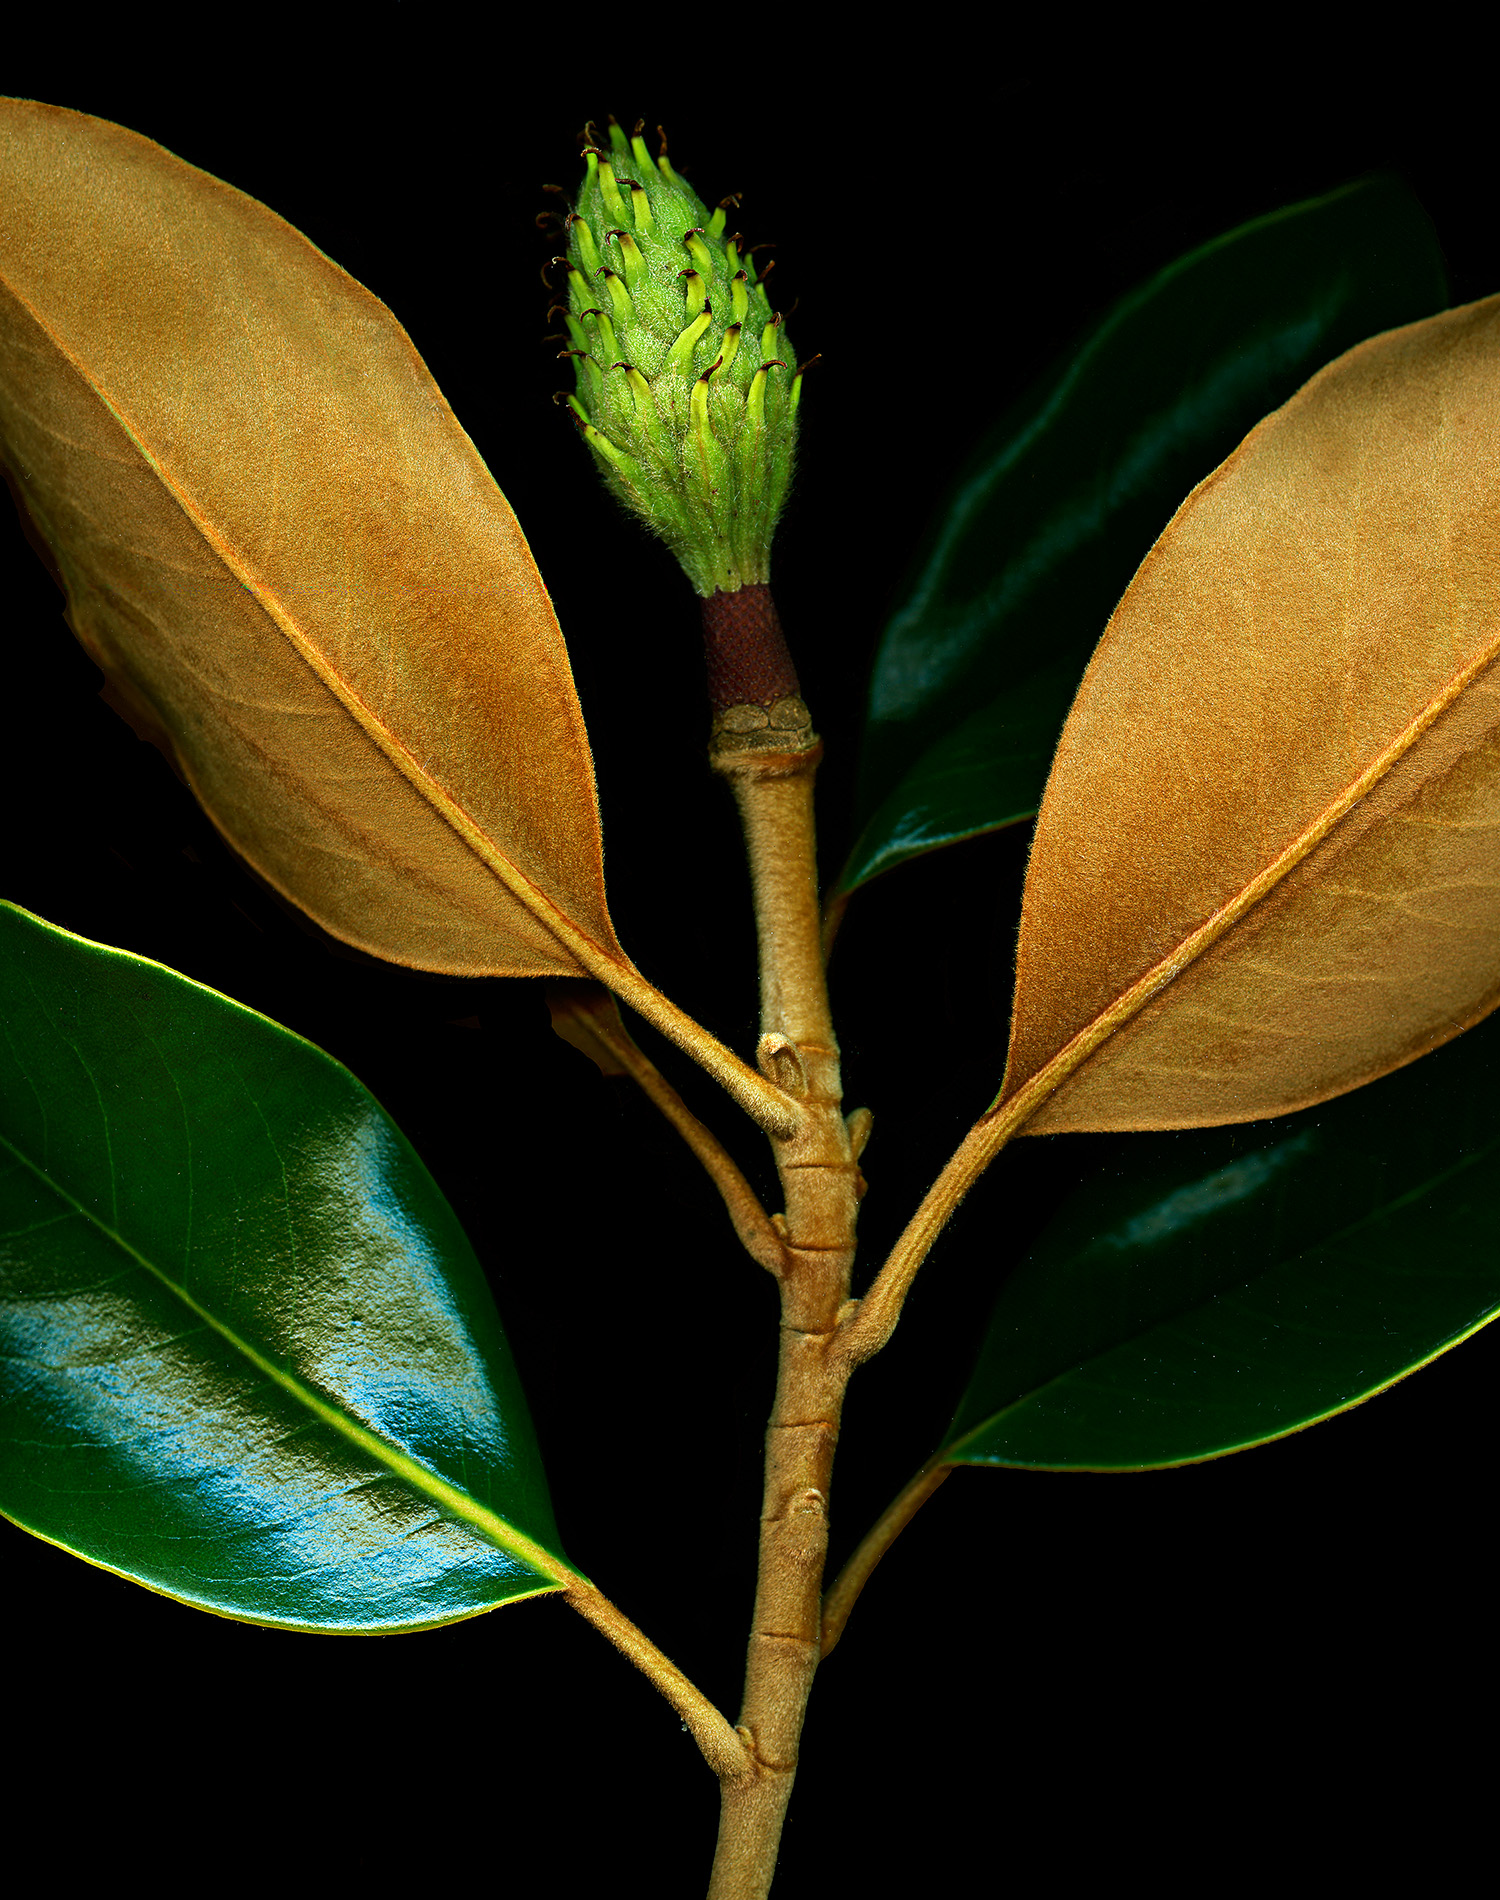 Magnolia-1900x1500-72dpi-Web.jpg